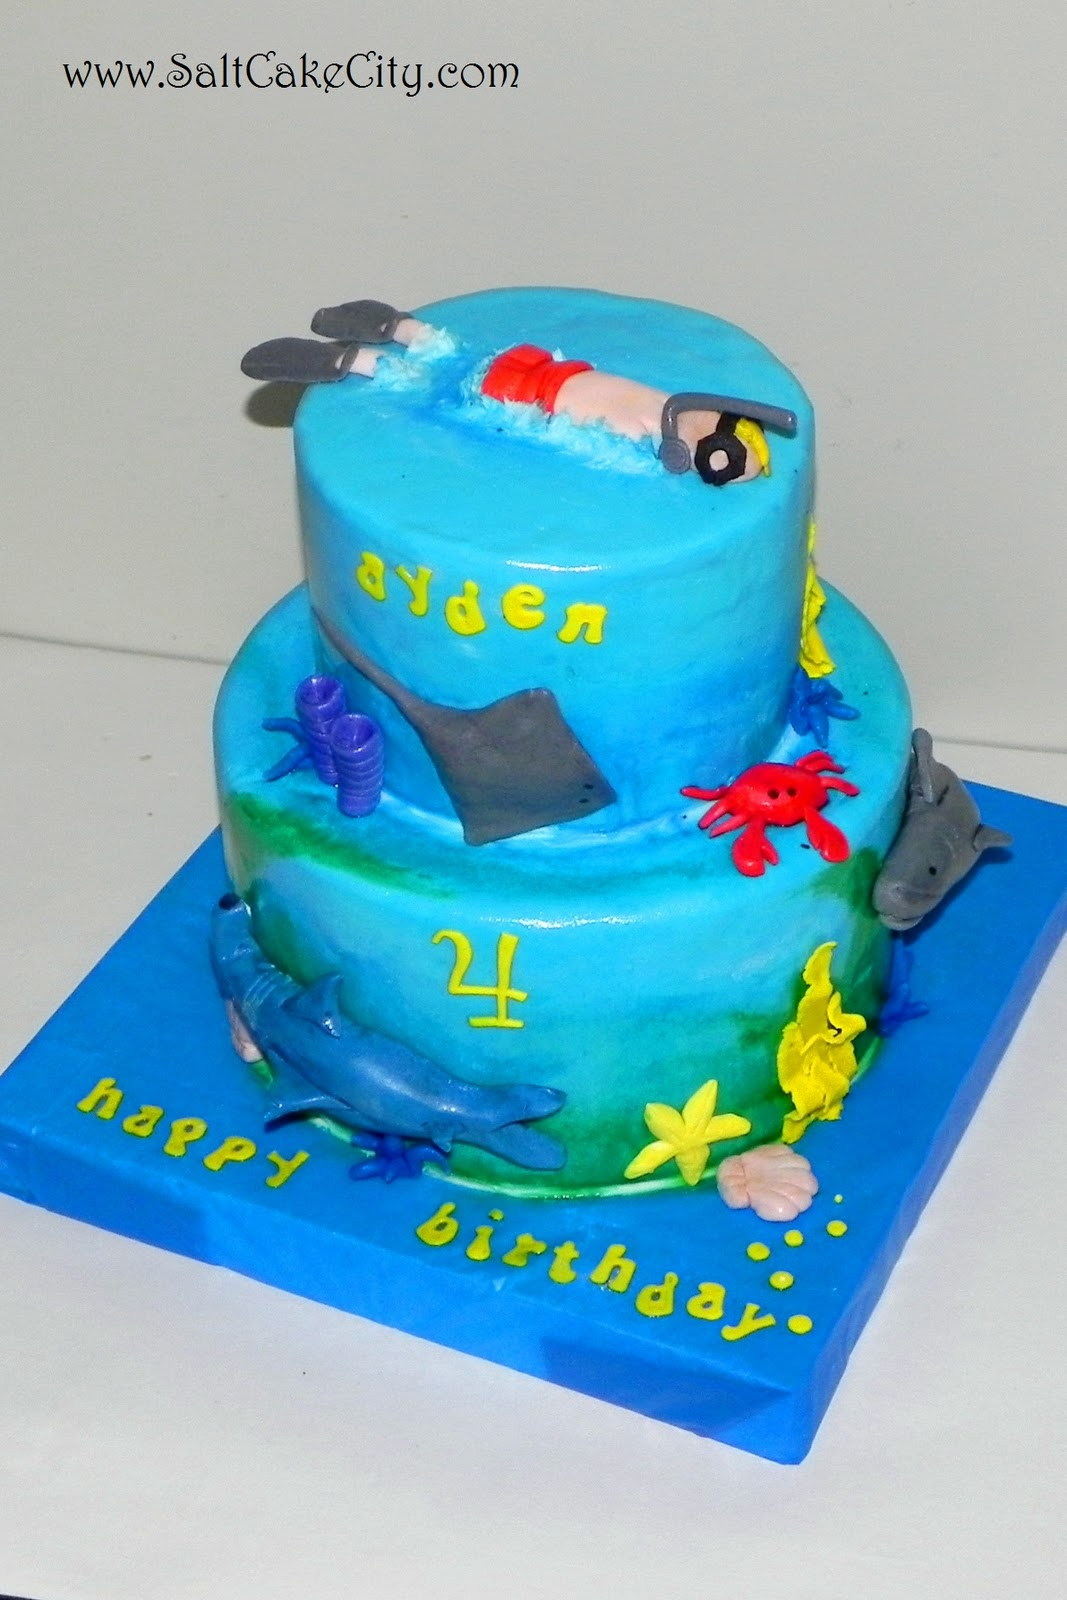 http://3.bp.blogspot.com/-Jvw9linbrBU/TwpDlLzHwVI/AAAAAAAABY8/dW7pmGSh9v8/s1600/362+Sharks+%2526+Stingrays+Cake.jpg